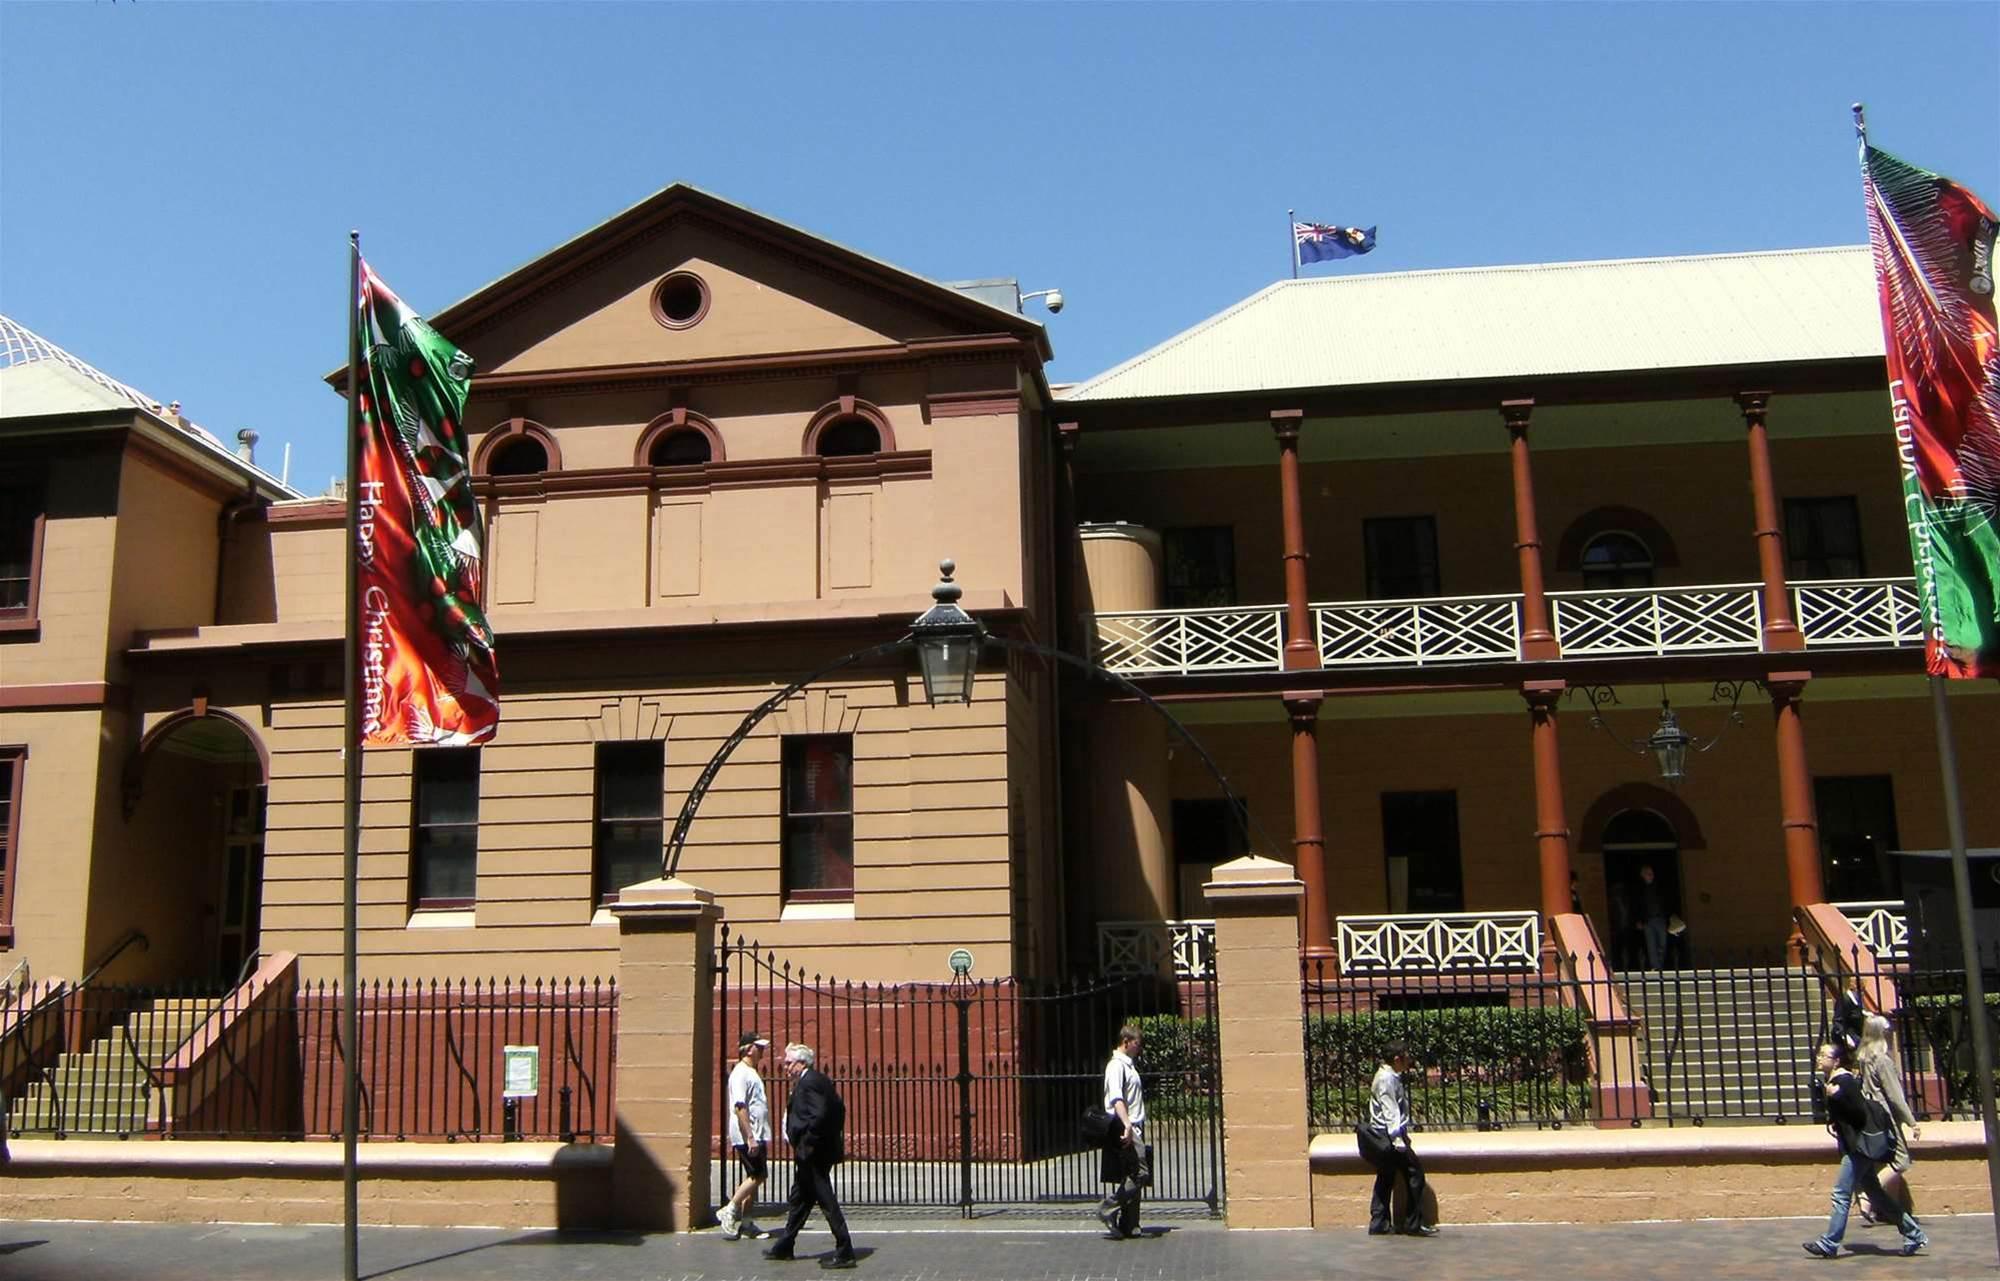 NSW passes digital transformation bill